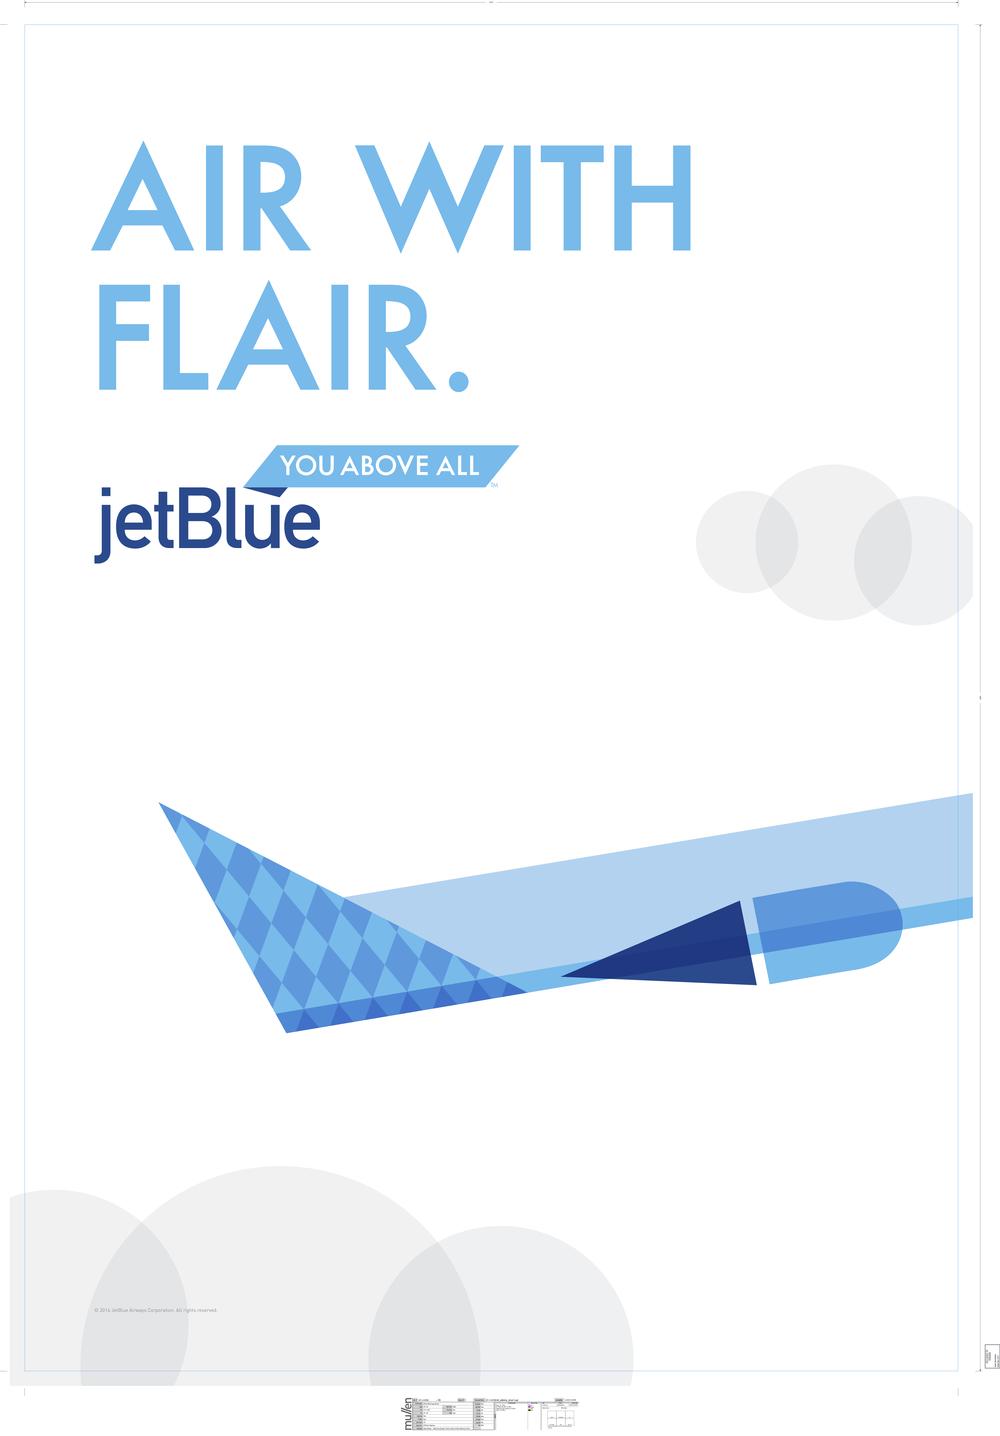 AirWithFlair.jpg